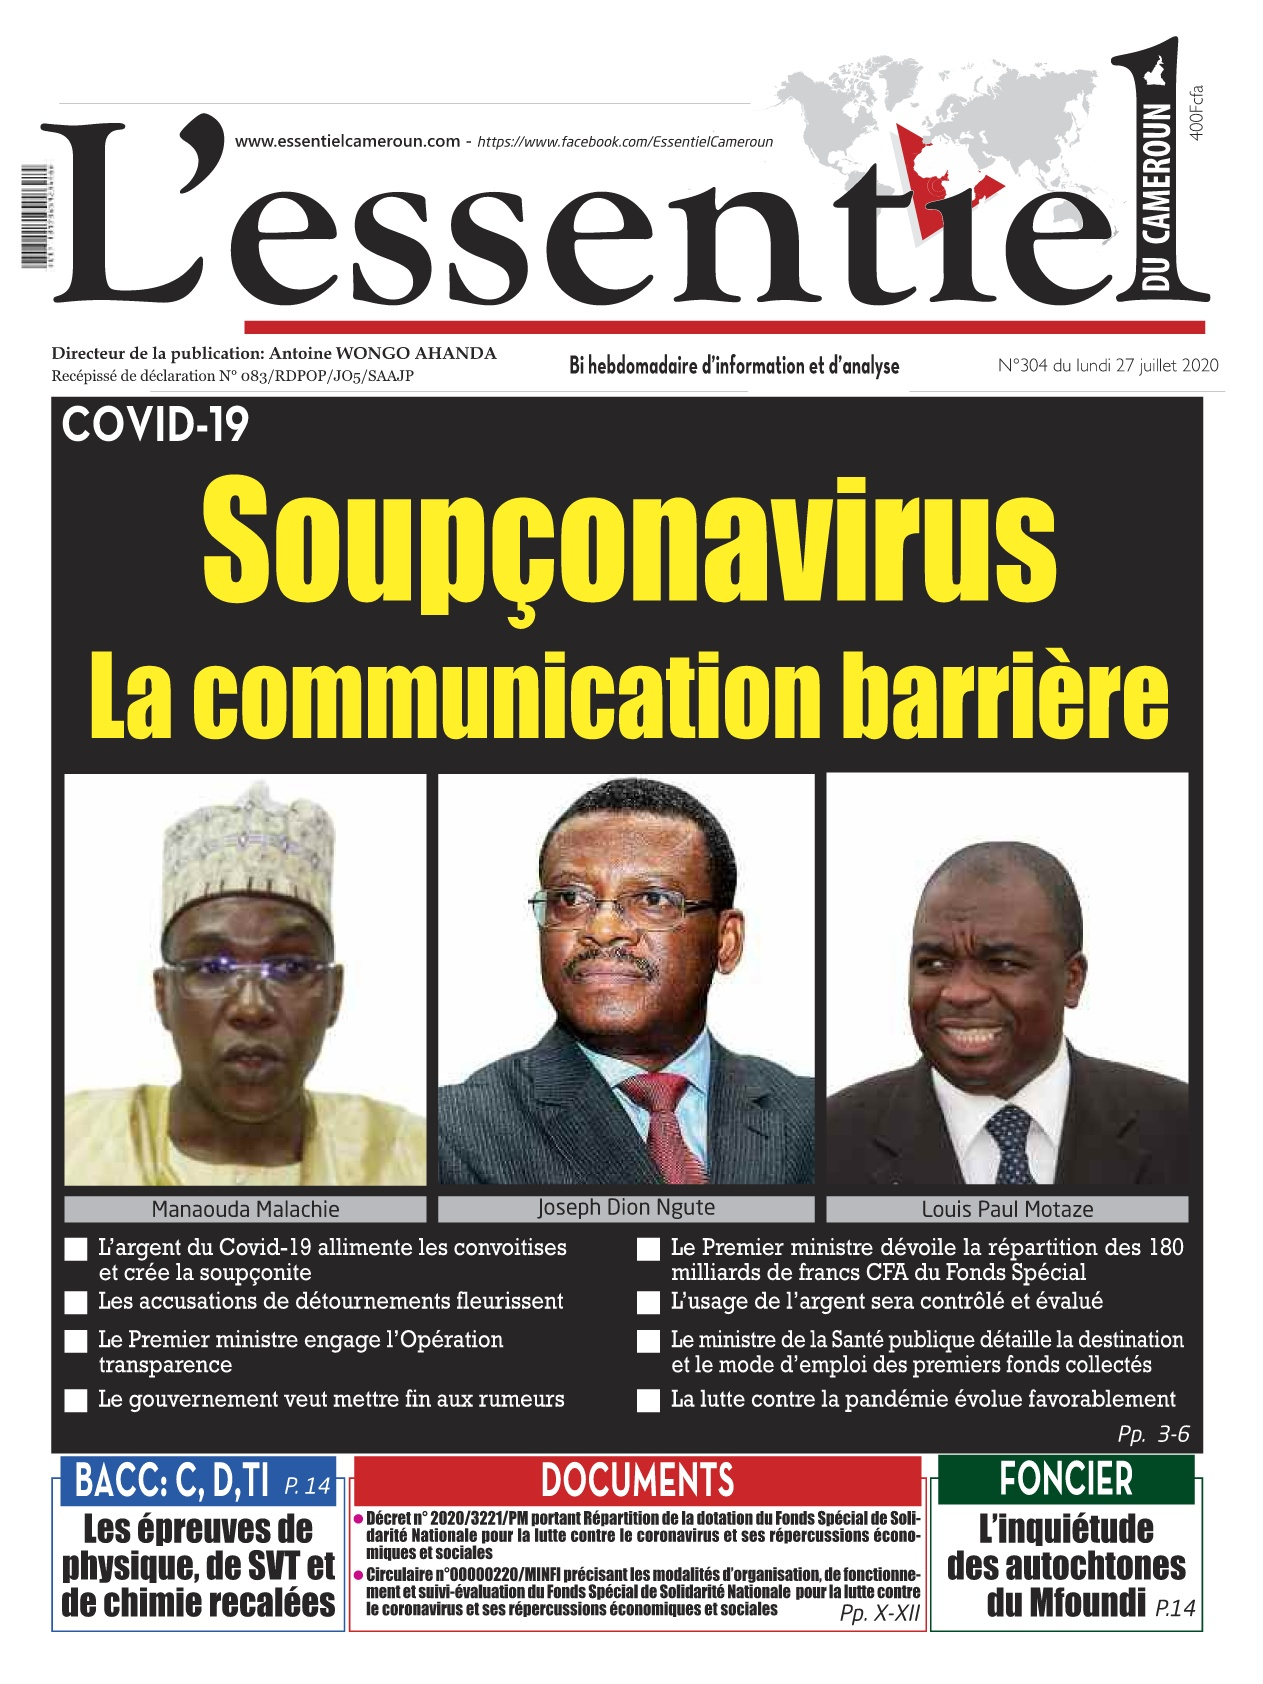 L'essentiel du Cameroun - 27/07/2020